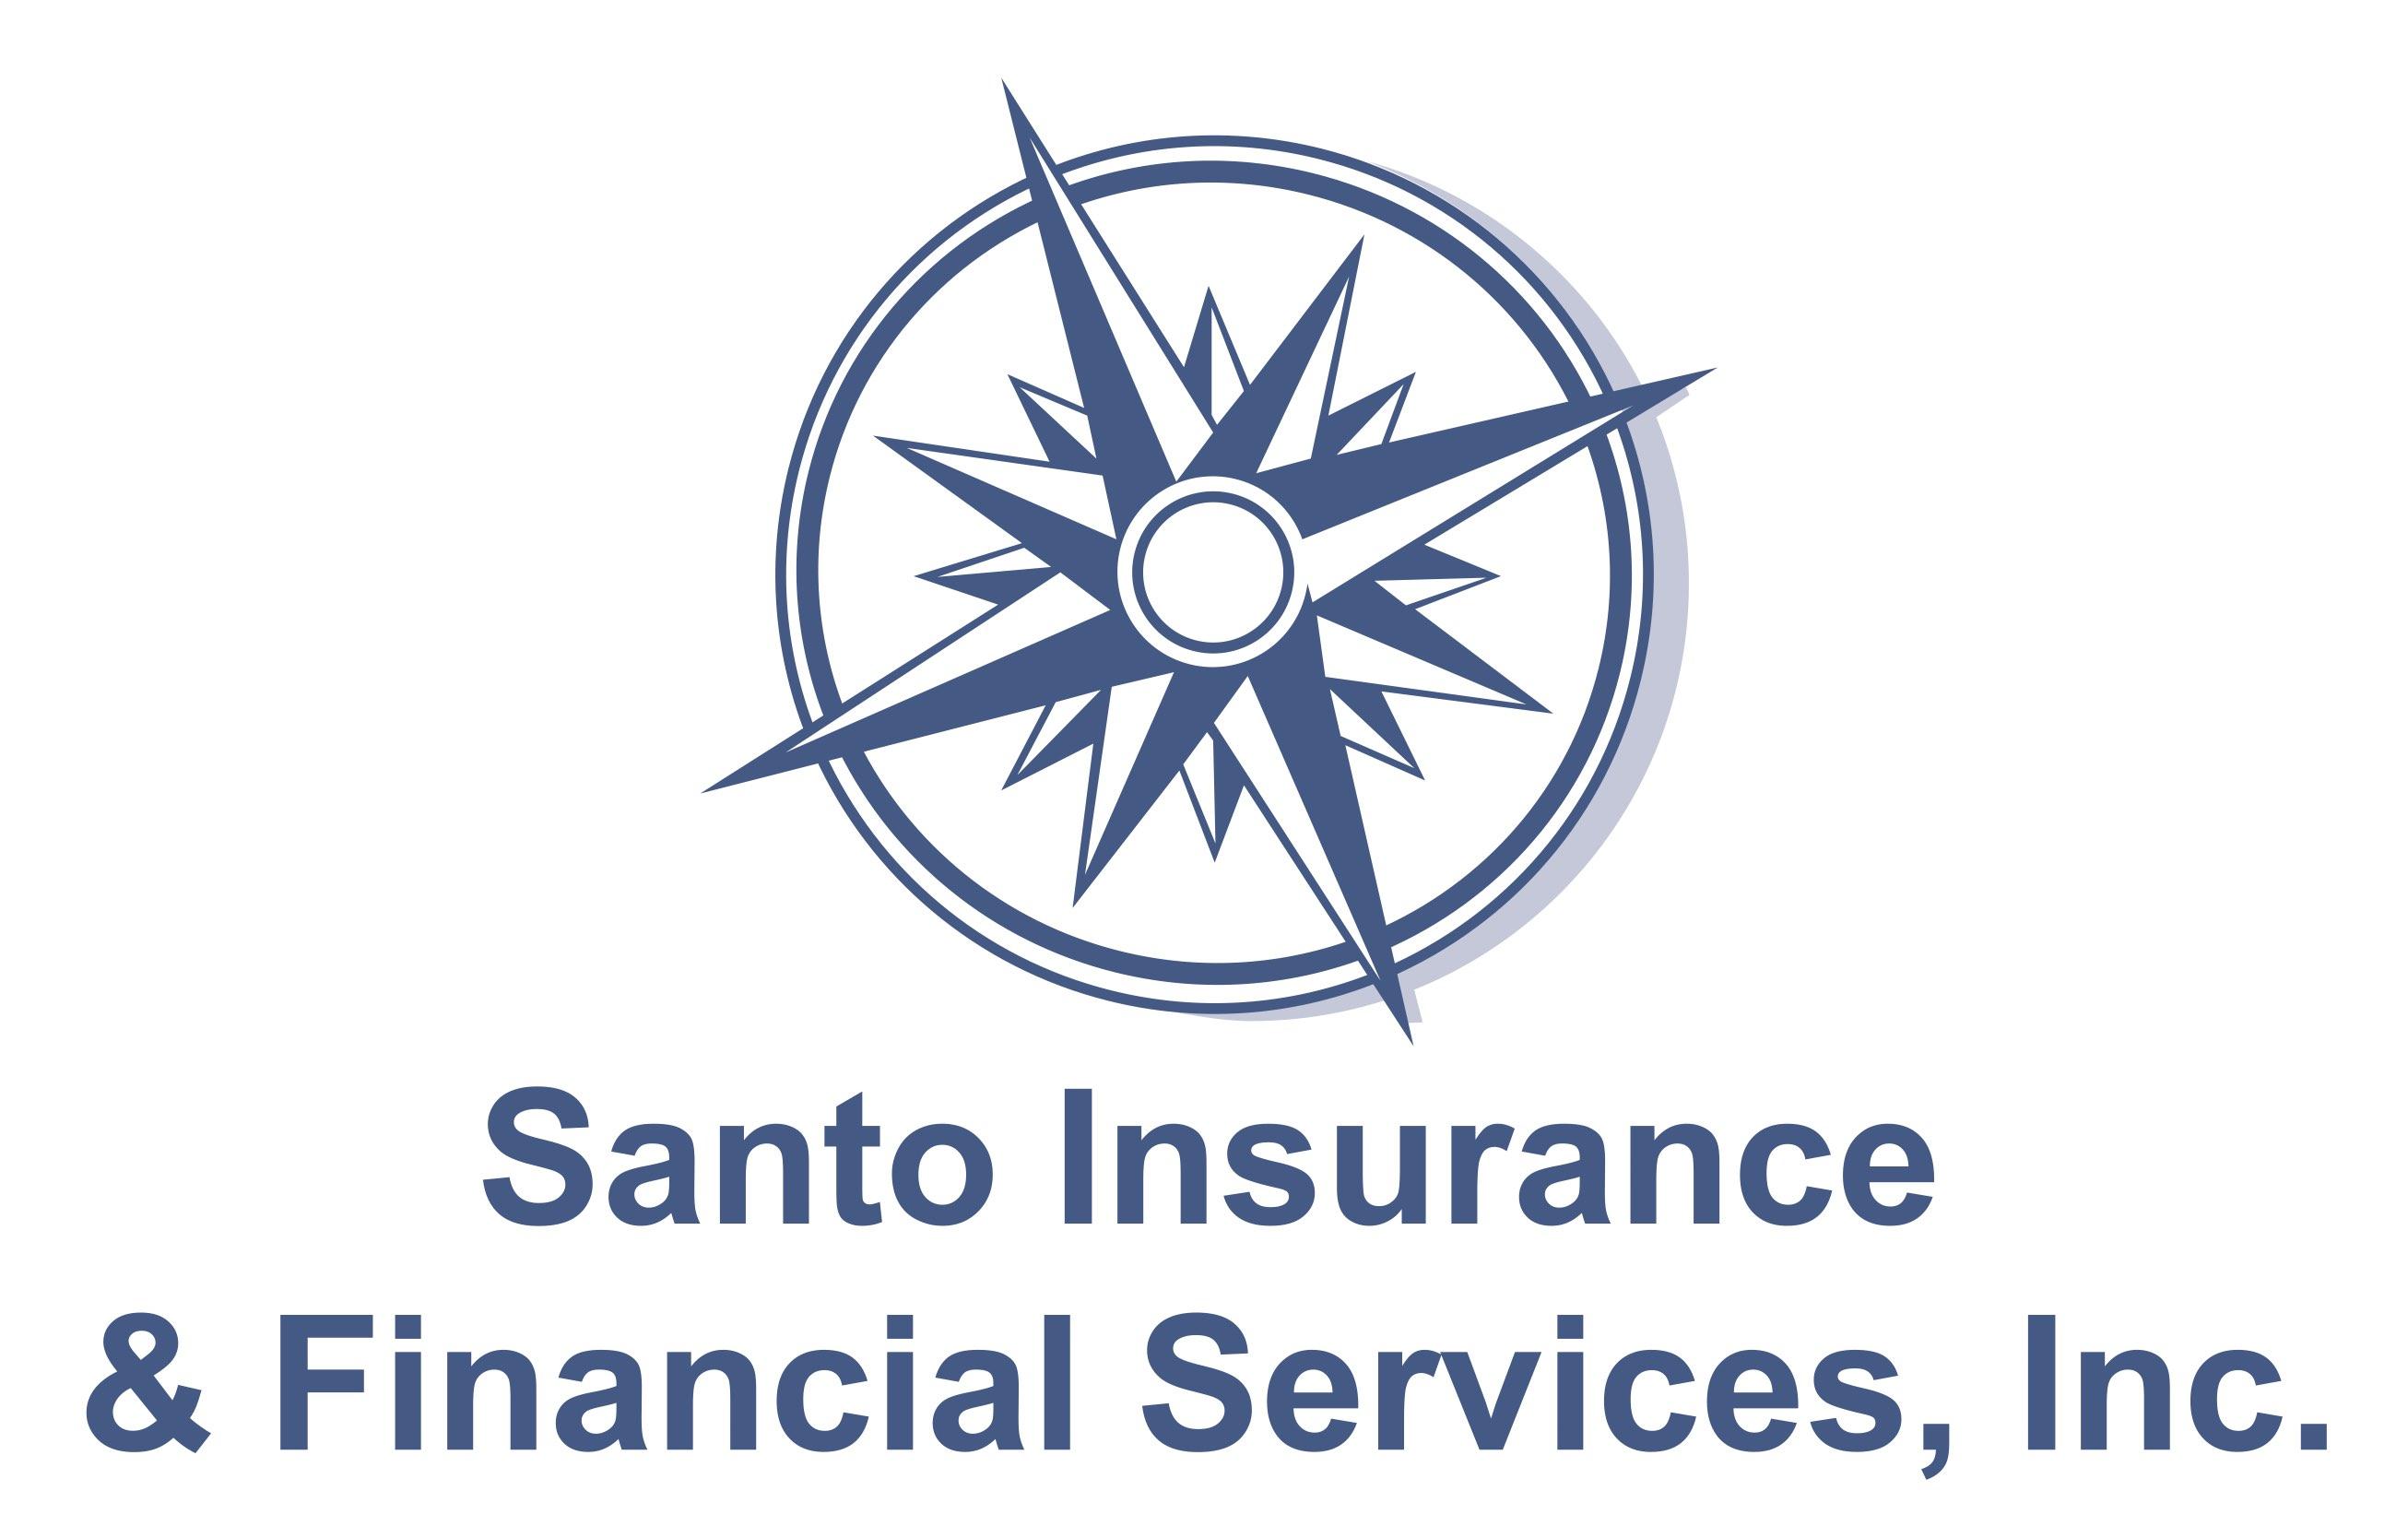 santo insurance1.jpg